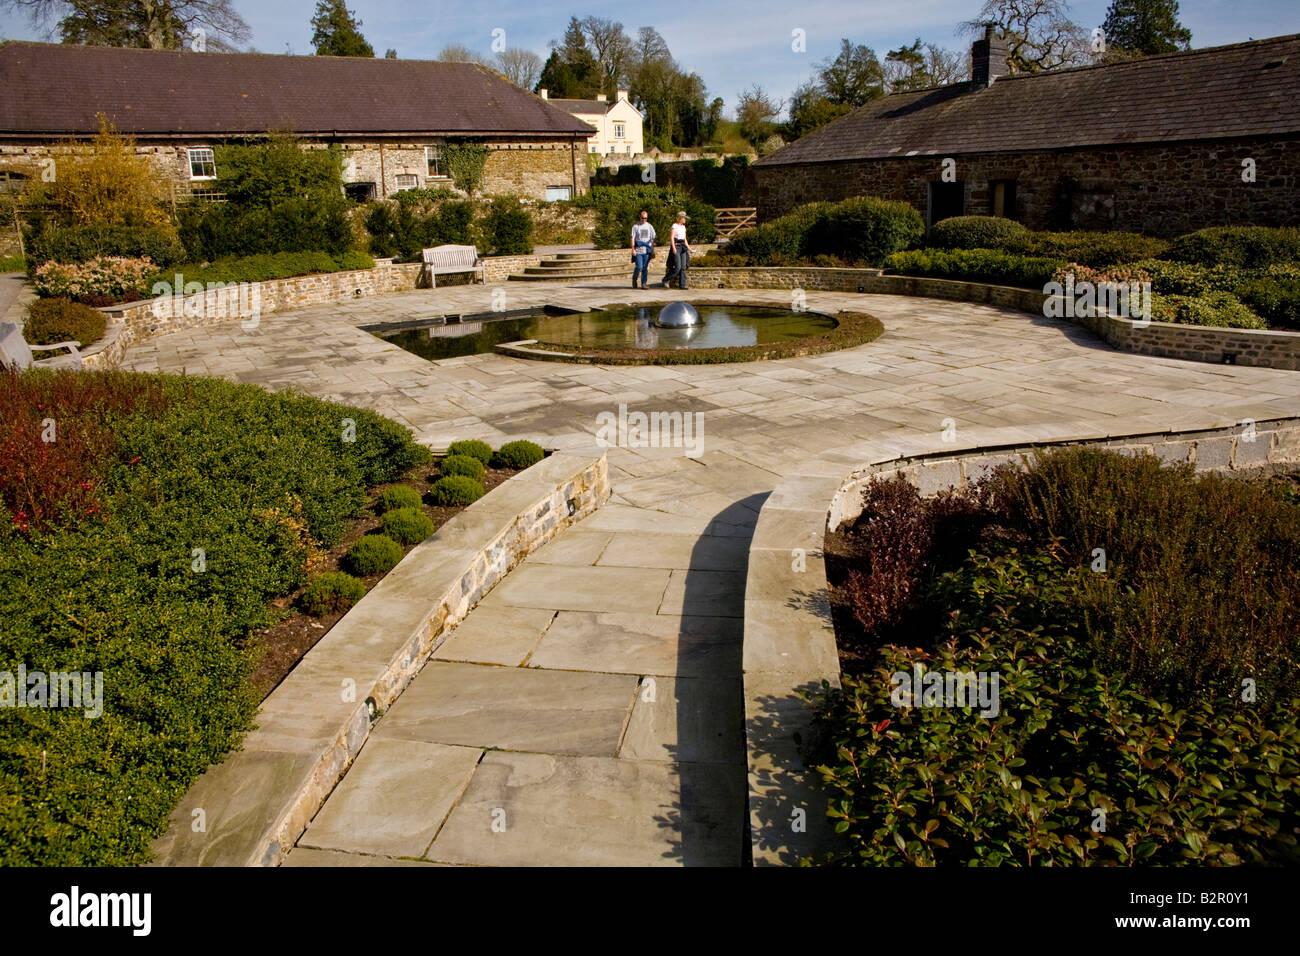 Aberglasney Stock Photos & Aberglasney Stock Images - Alamy